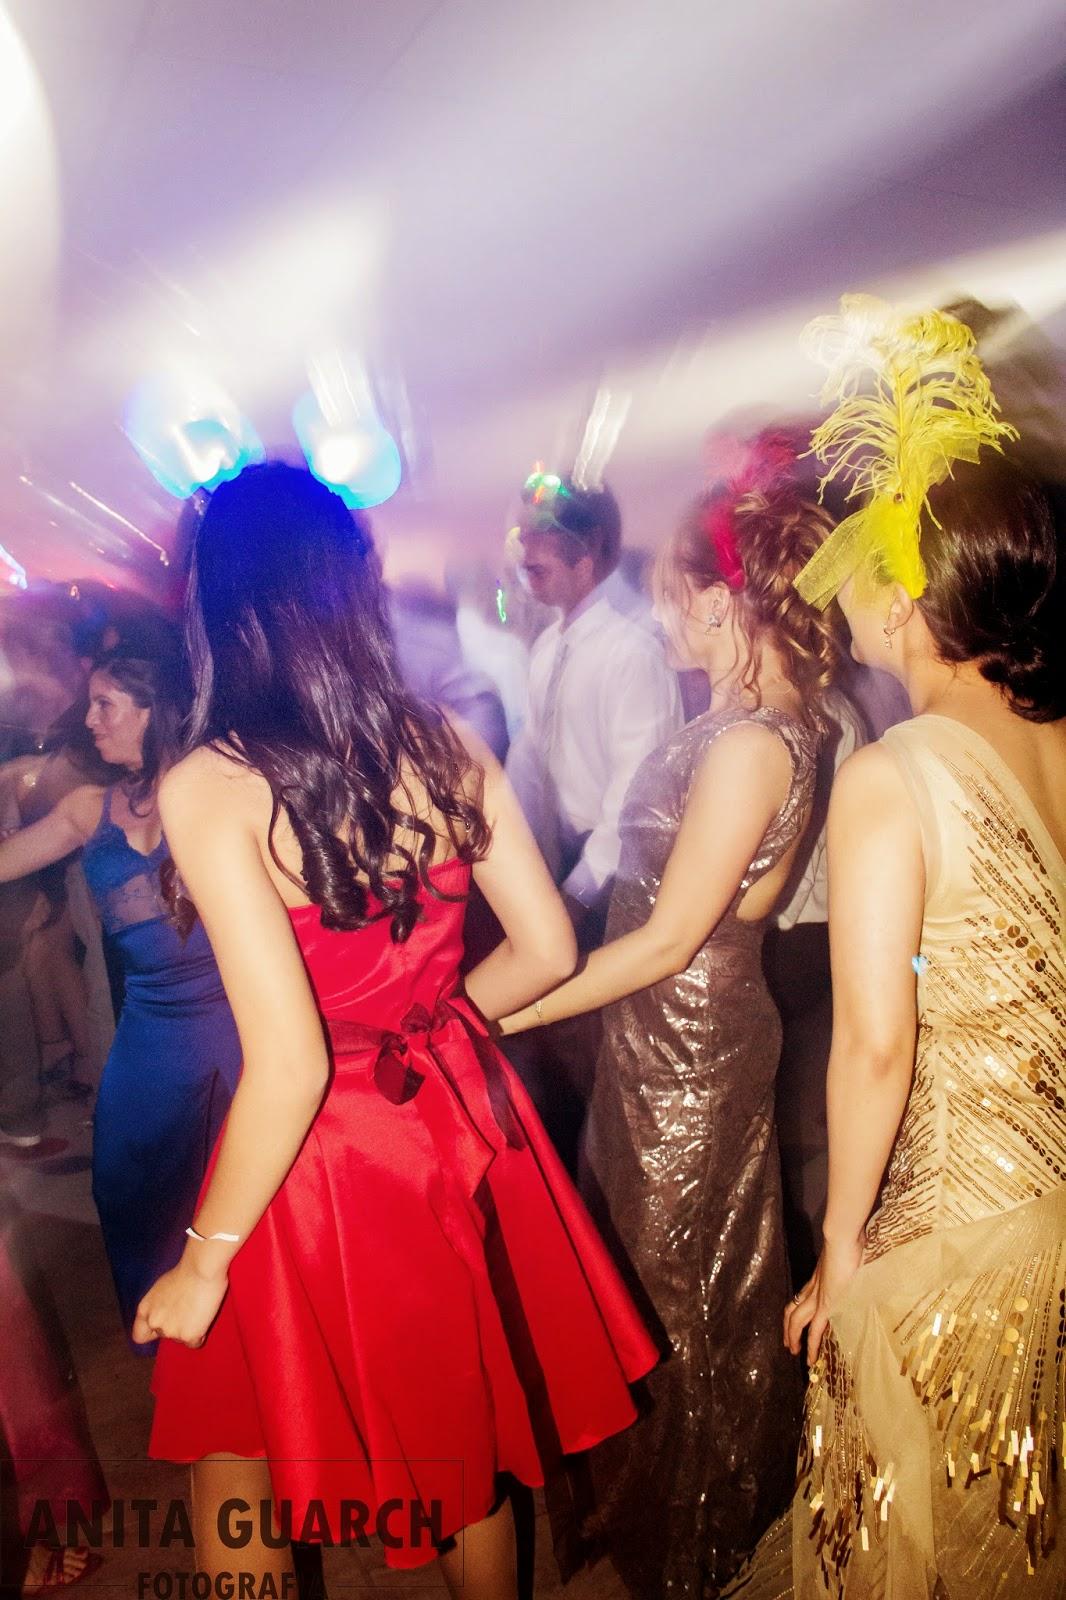 boda,casamiento,eventos,foto,fotografia,profesional,cordoba,argentina,rafhaeleventos,civil,iglesia,pre-boda,weddin